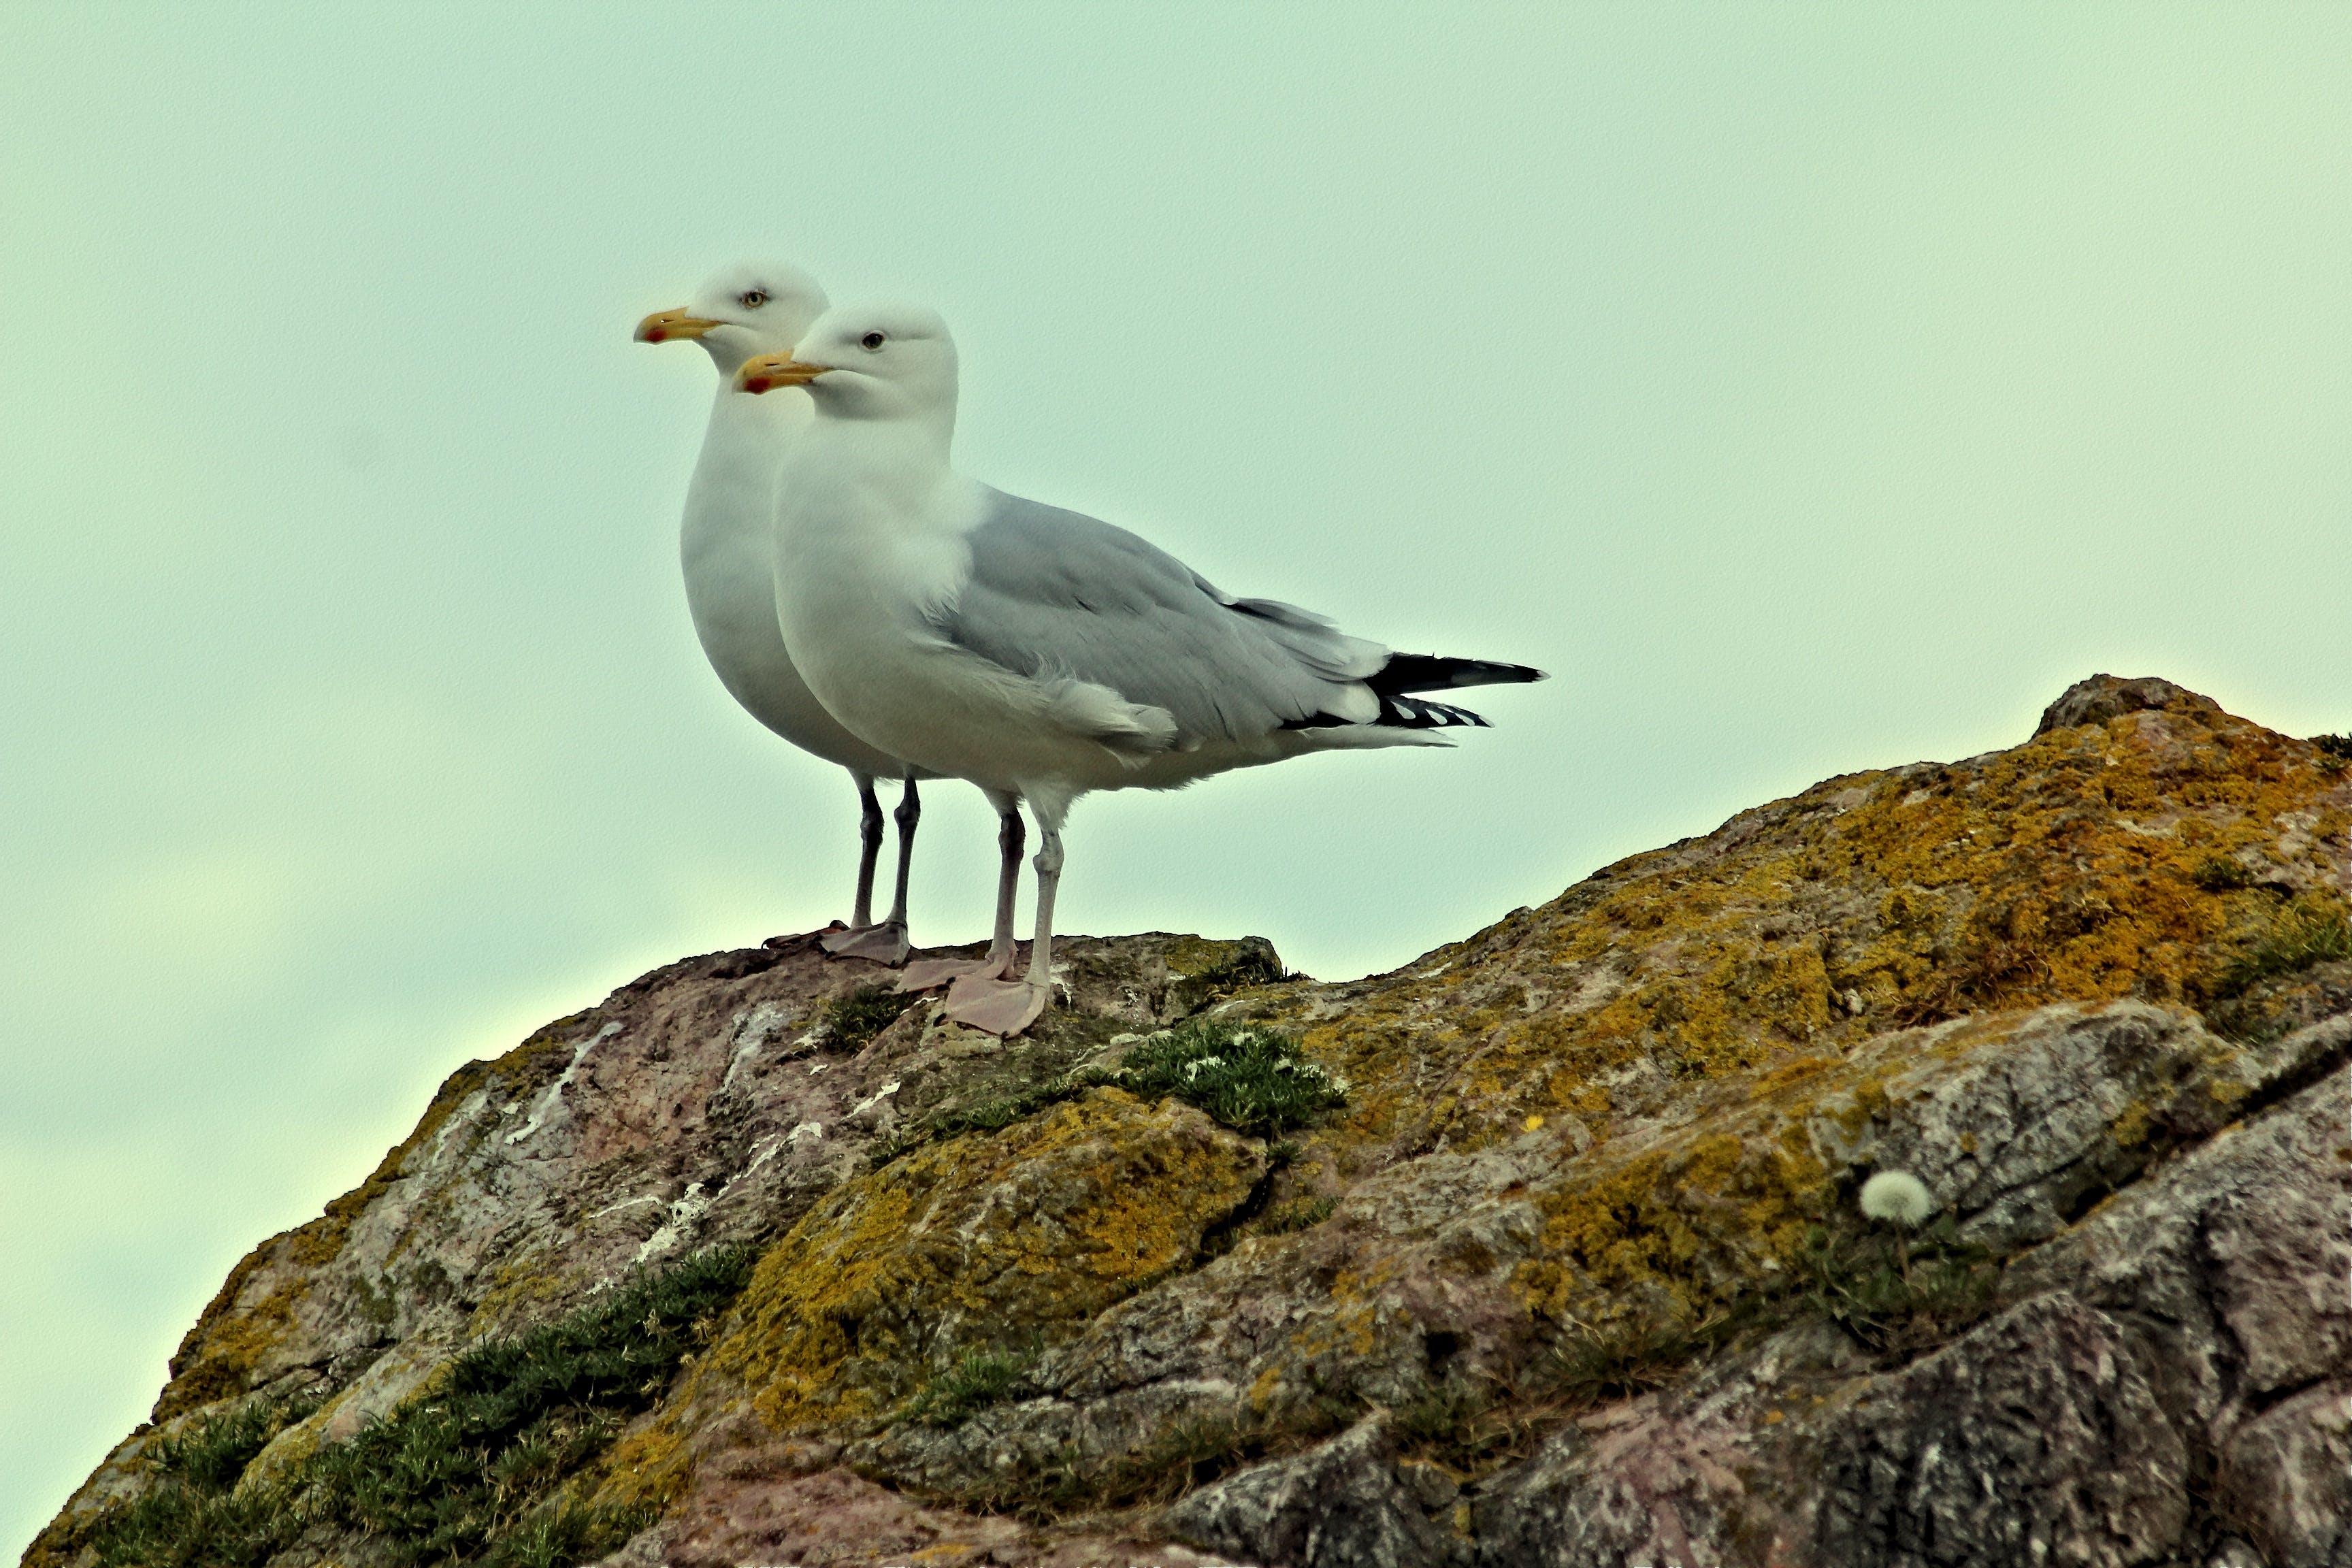 Two White Seagulls on Rock